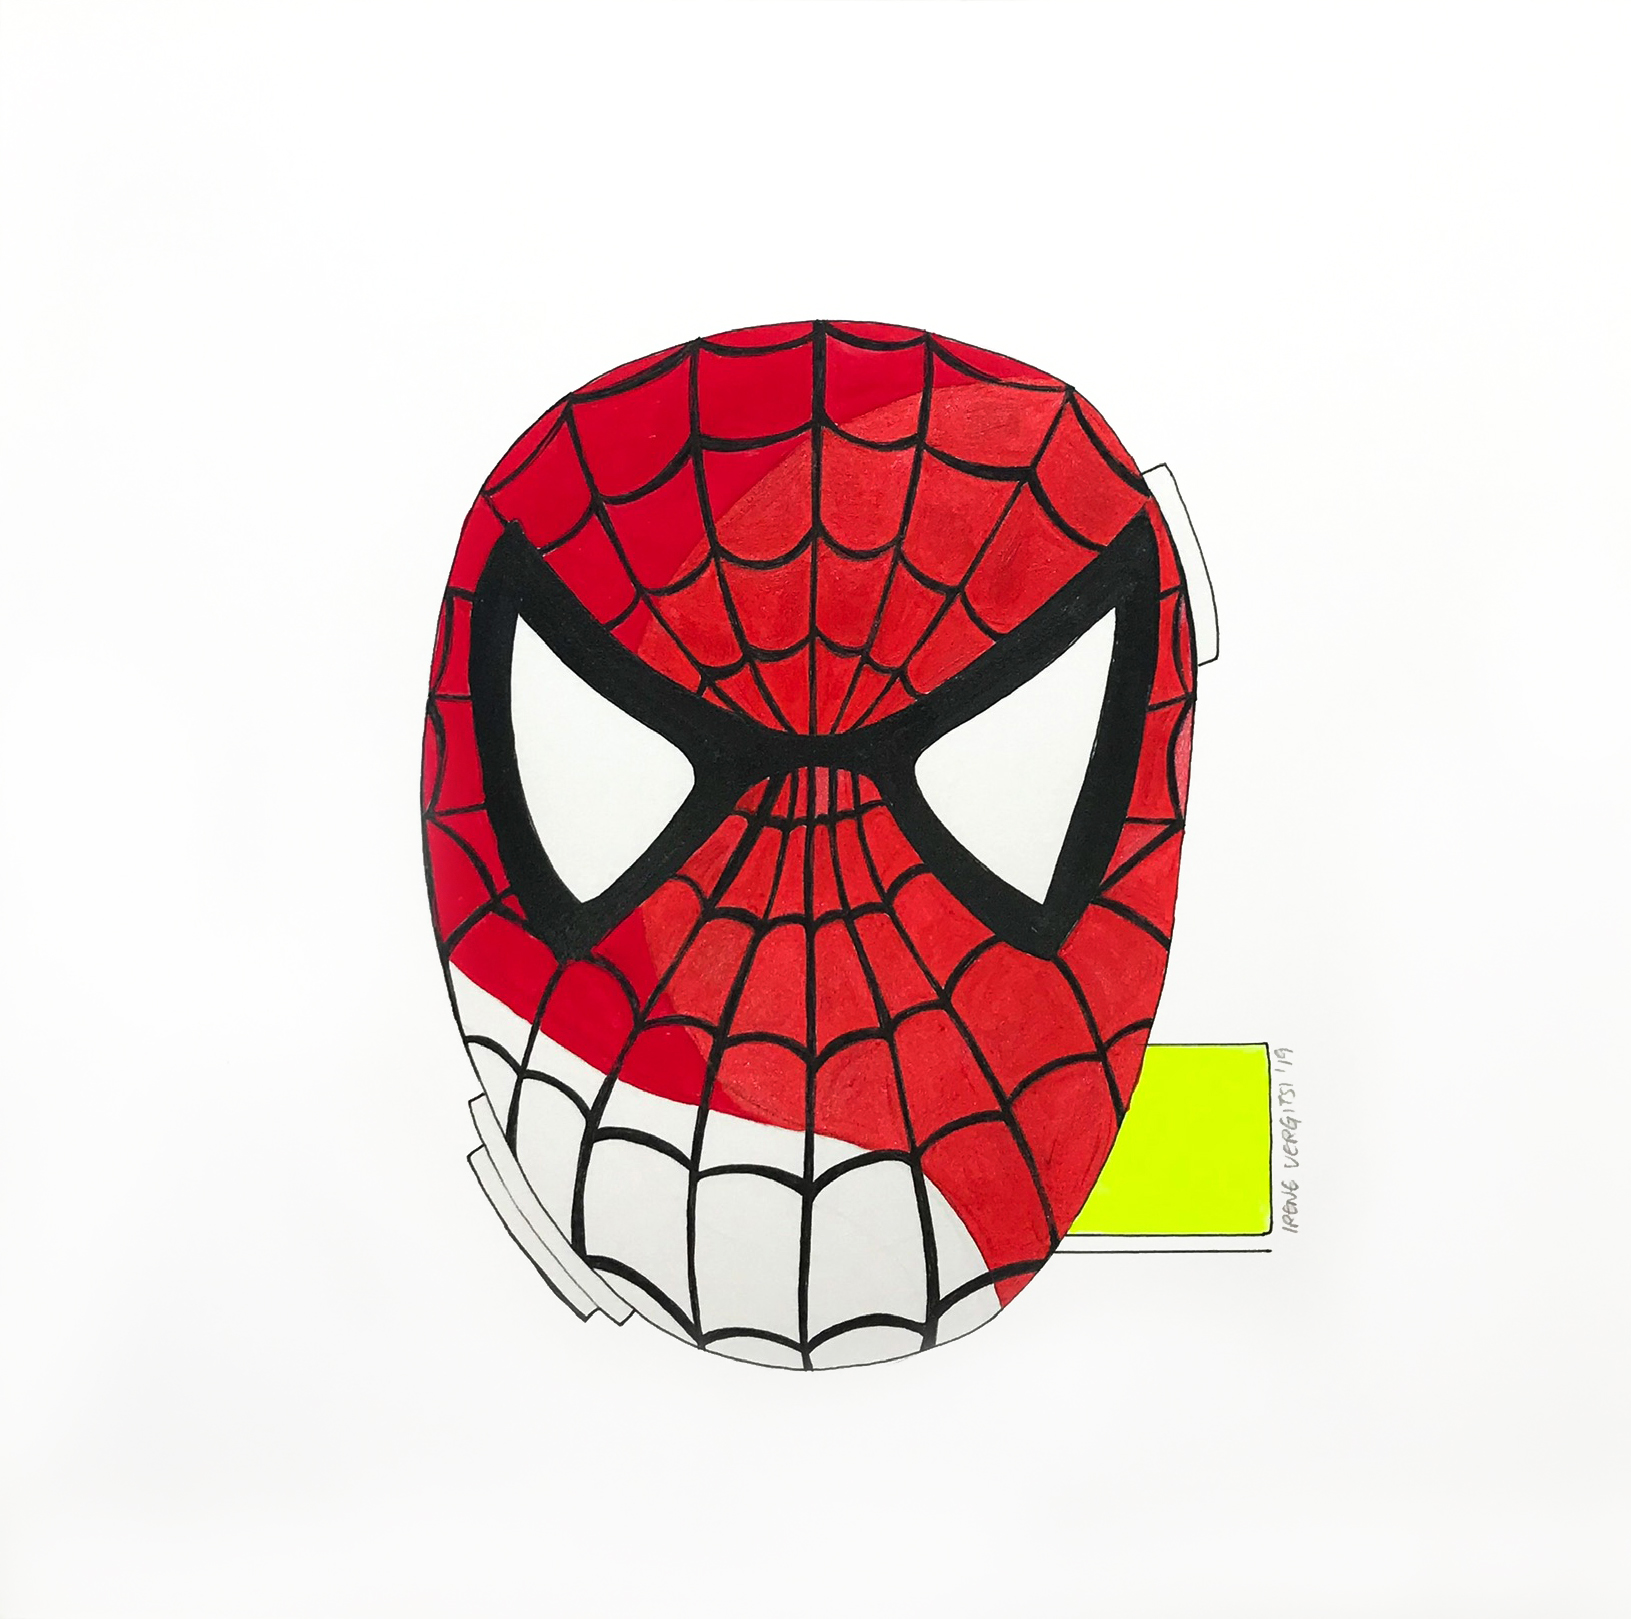 (Peter) 1 1